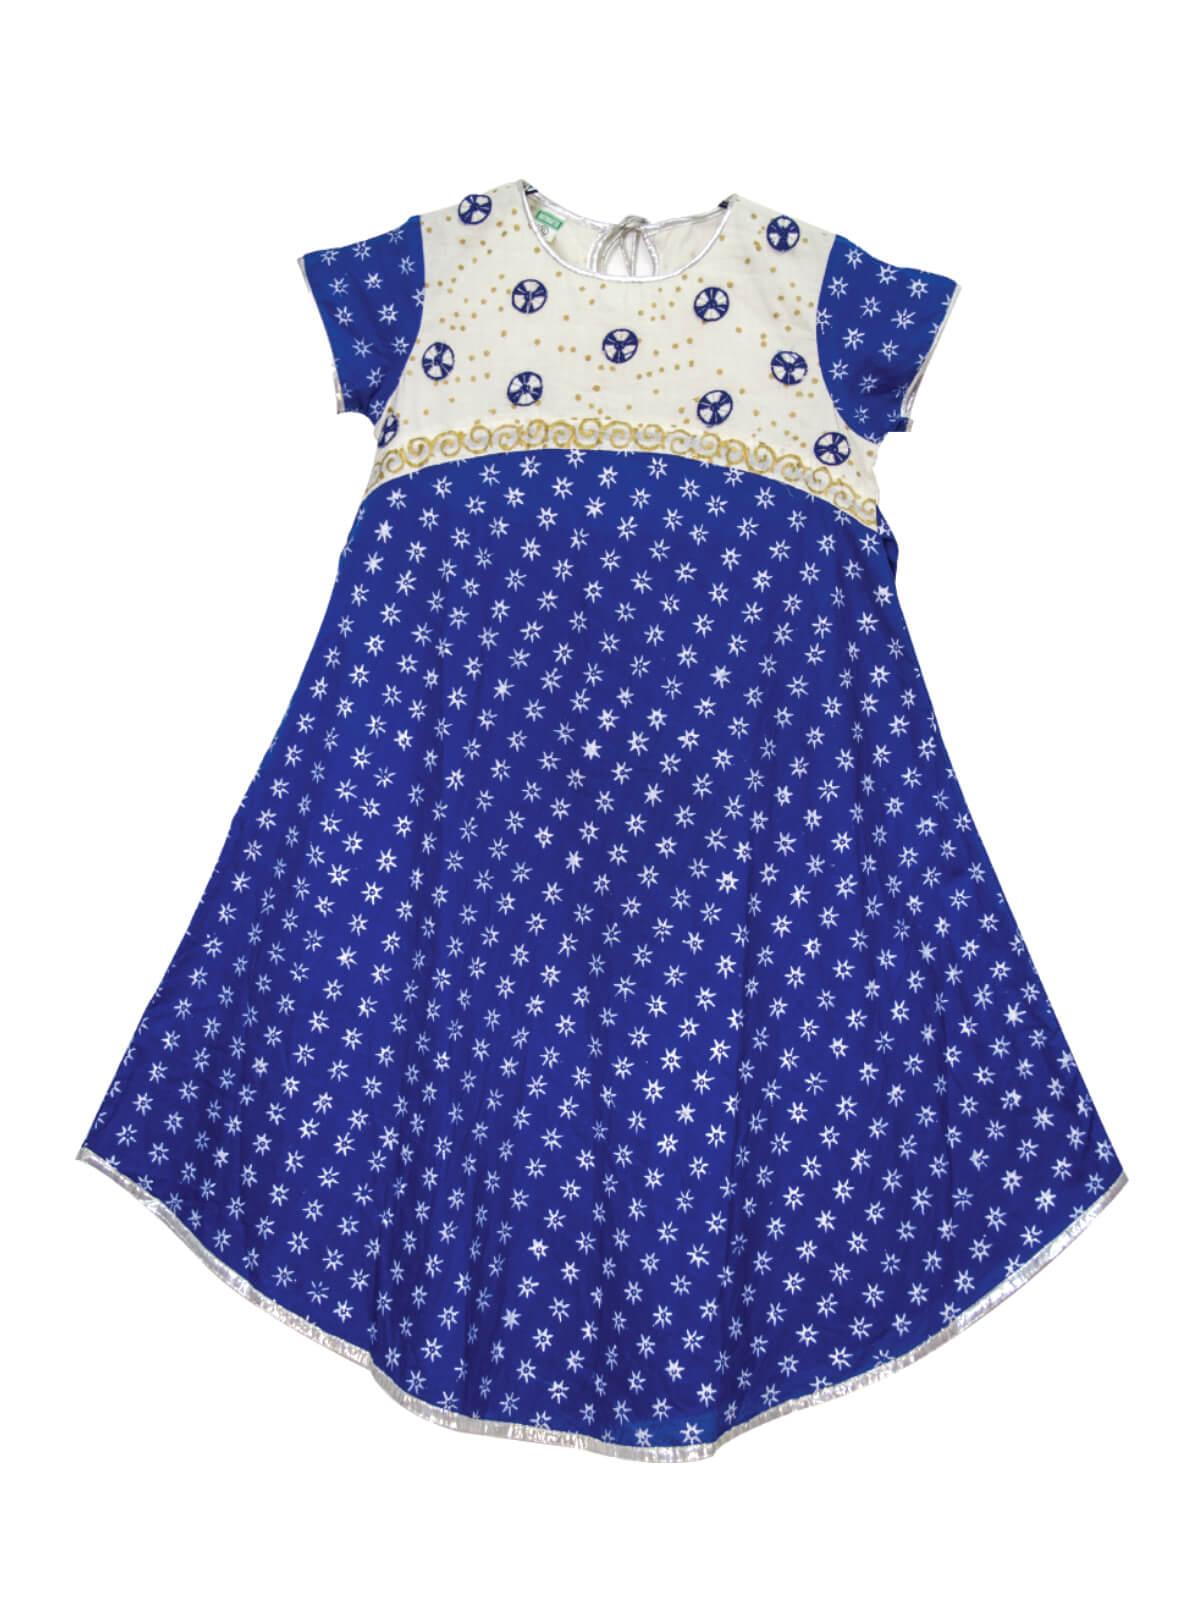 Lapis Blue Cotton Dress For Girls